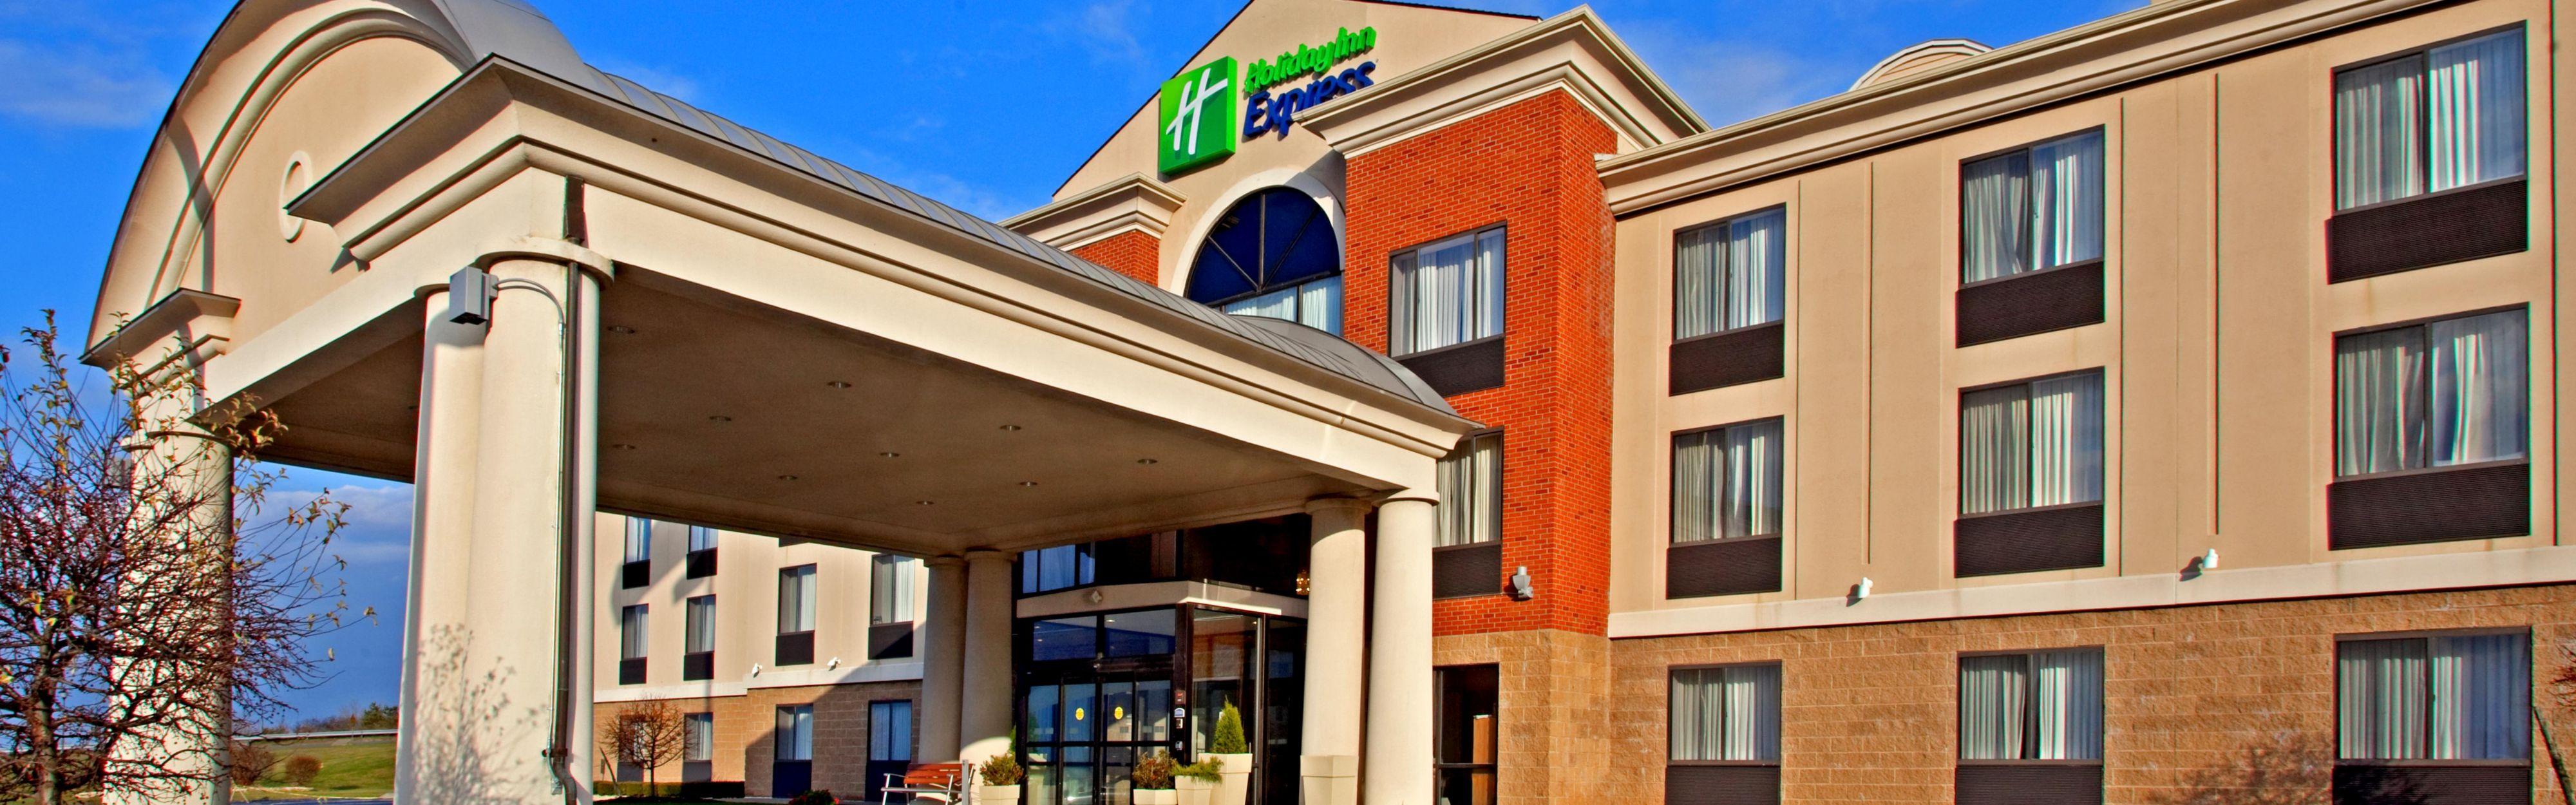 Holiday Inn Express & Suites East Greenbush(Albany-Skyline) image 0